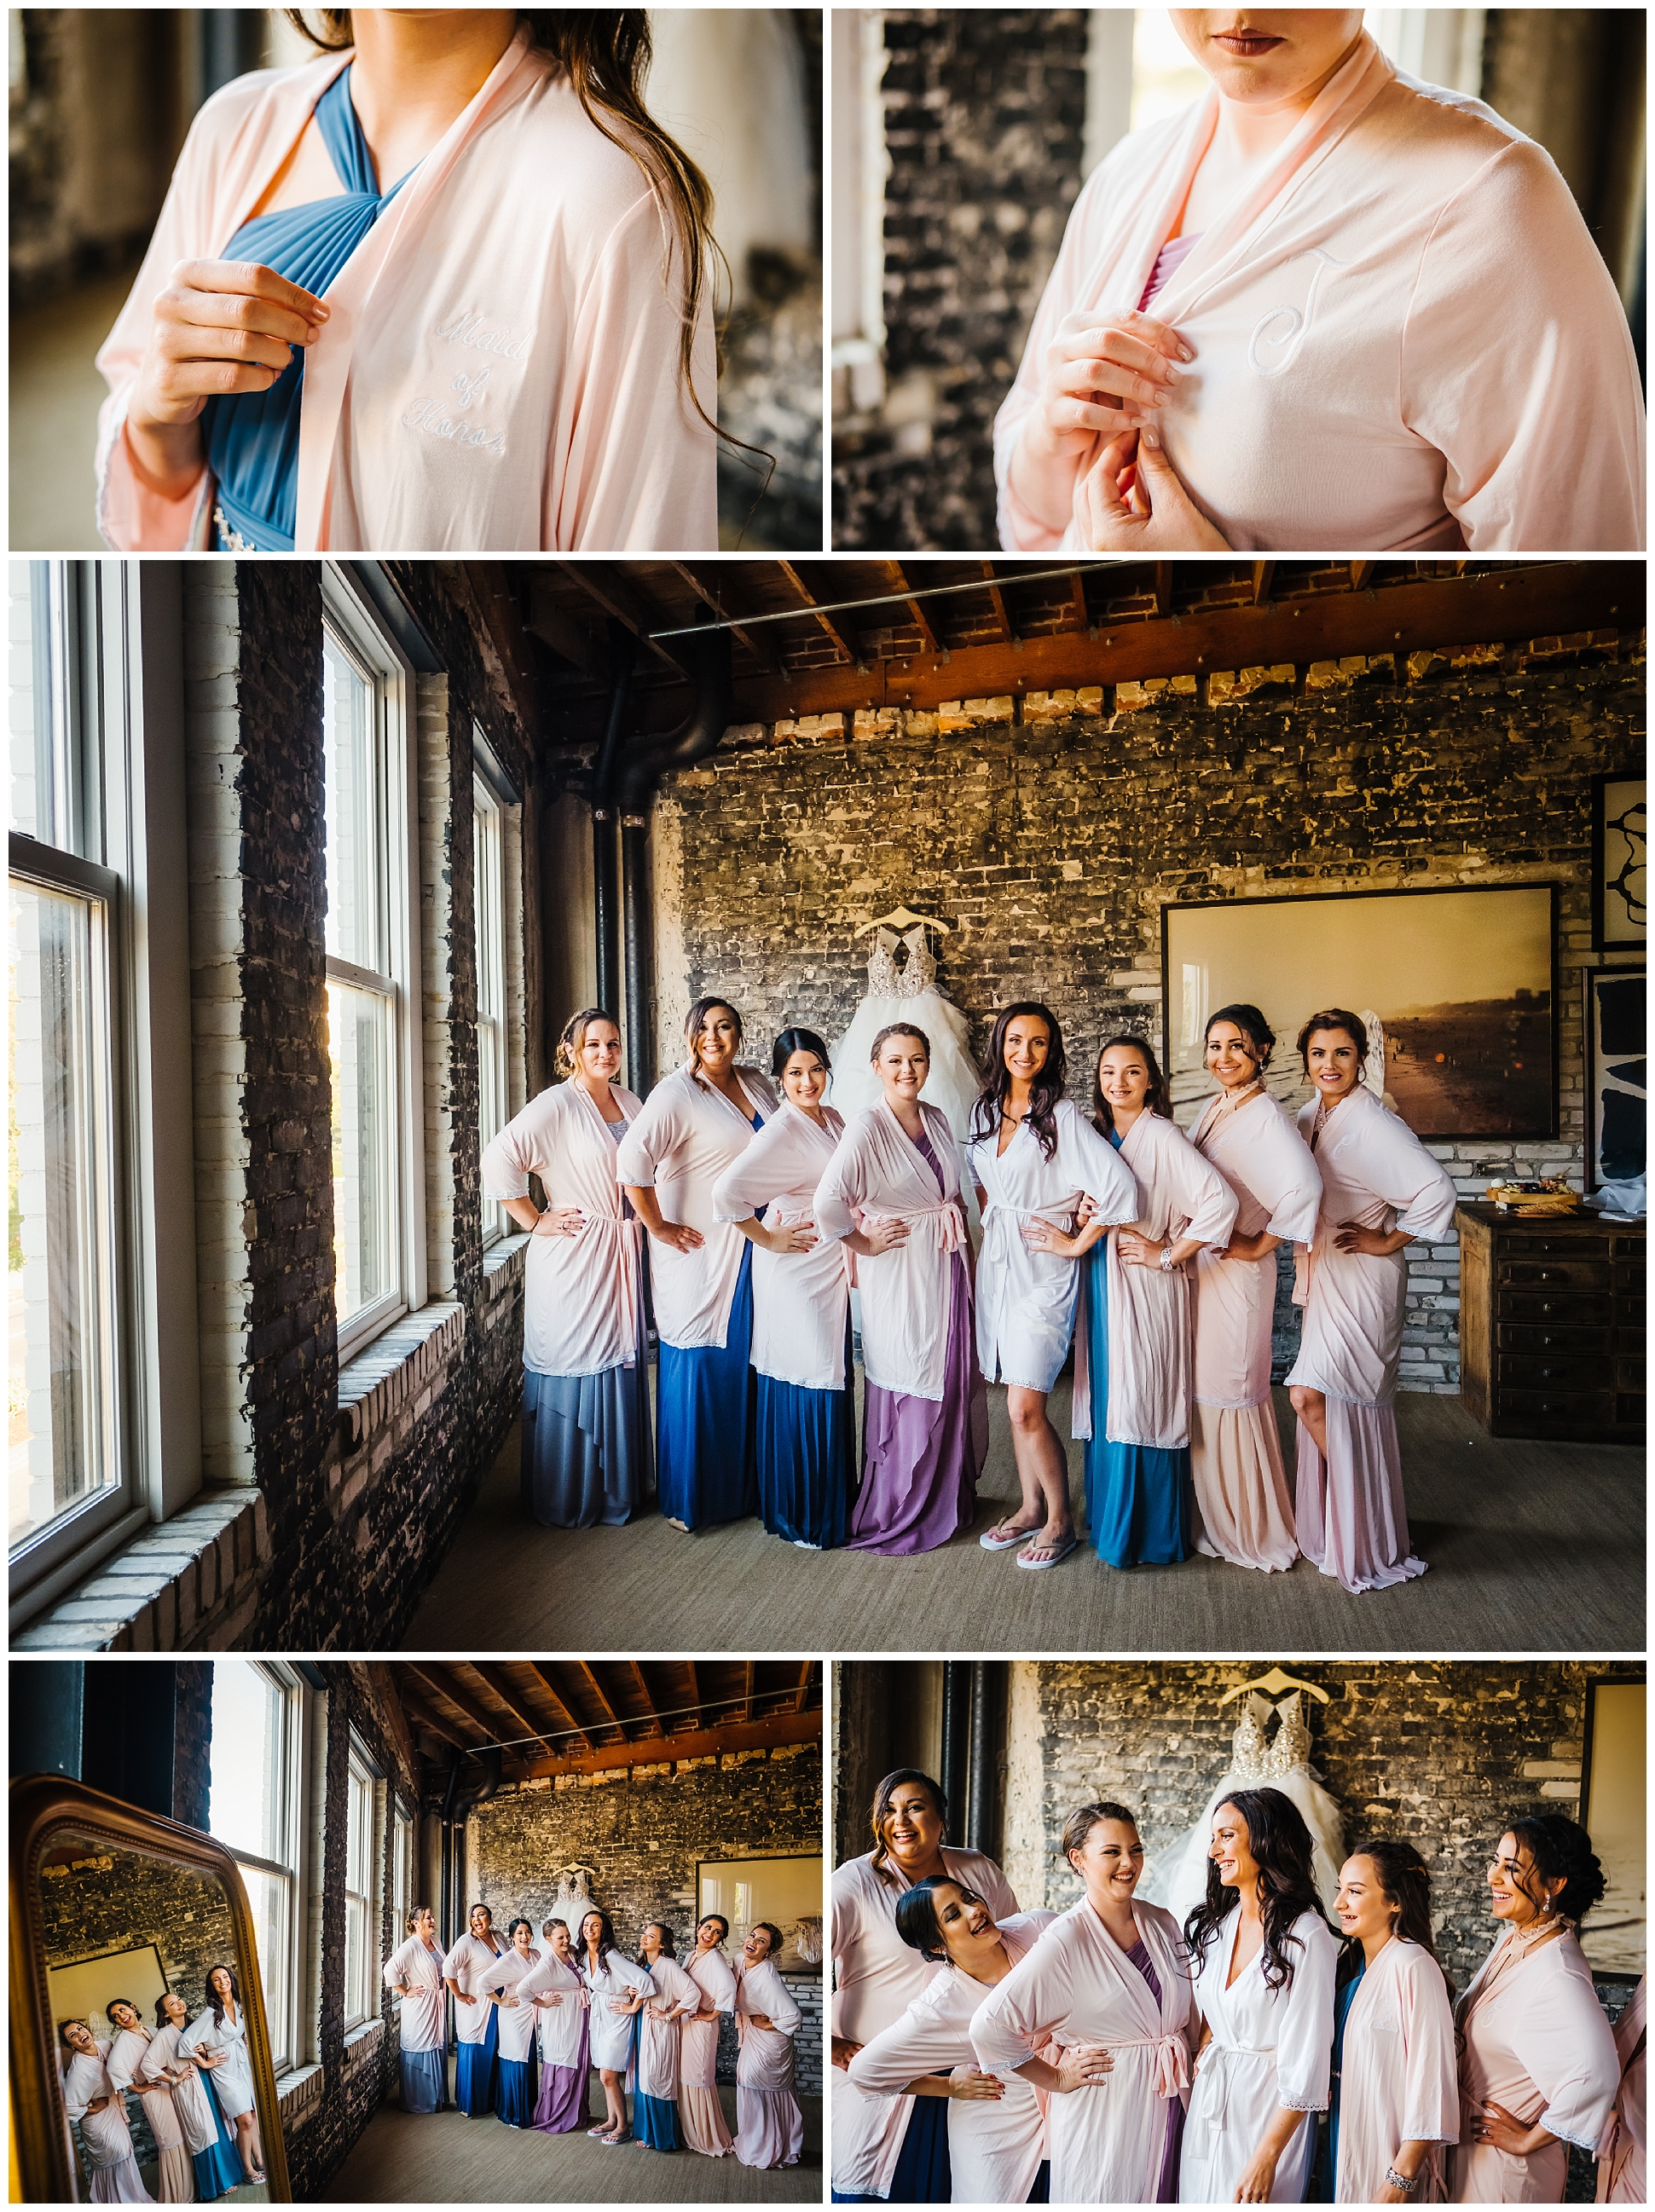 tampa-wedding-photographer-oxford-exchange-garland-candlelight-gold-hayley-paige_0008.jpg